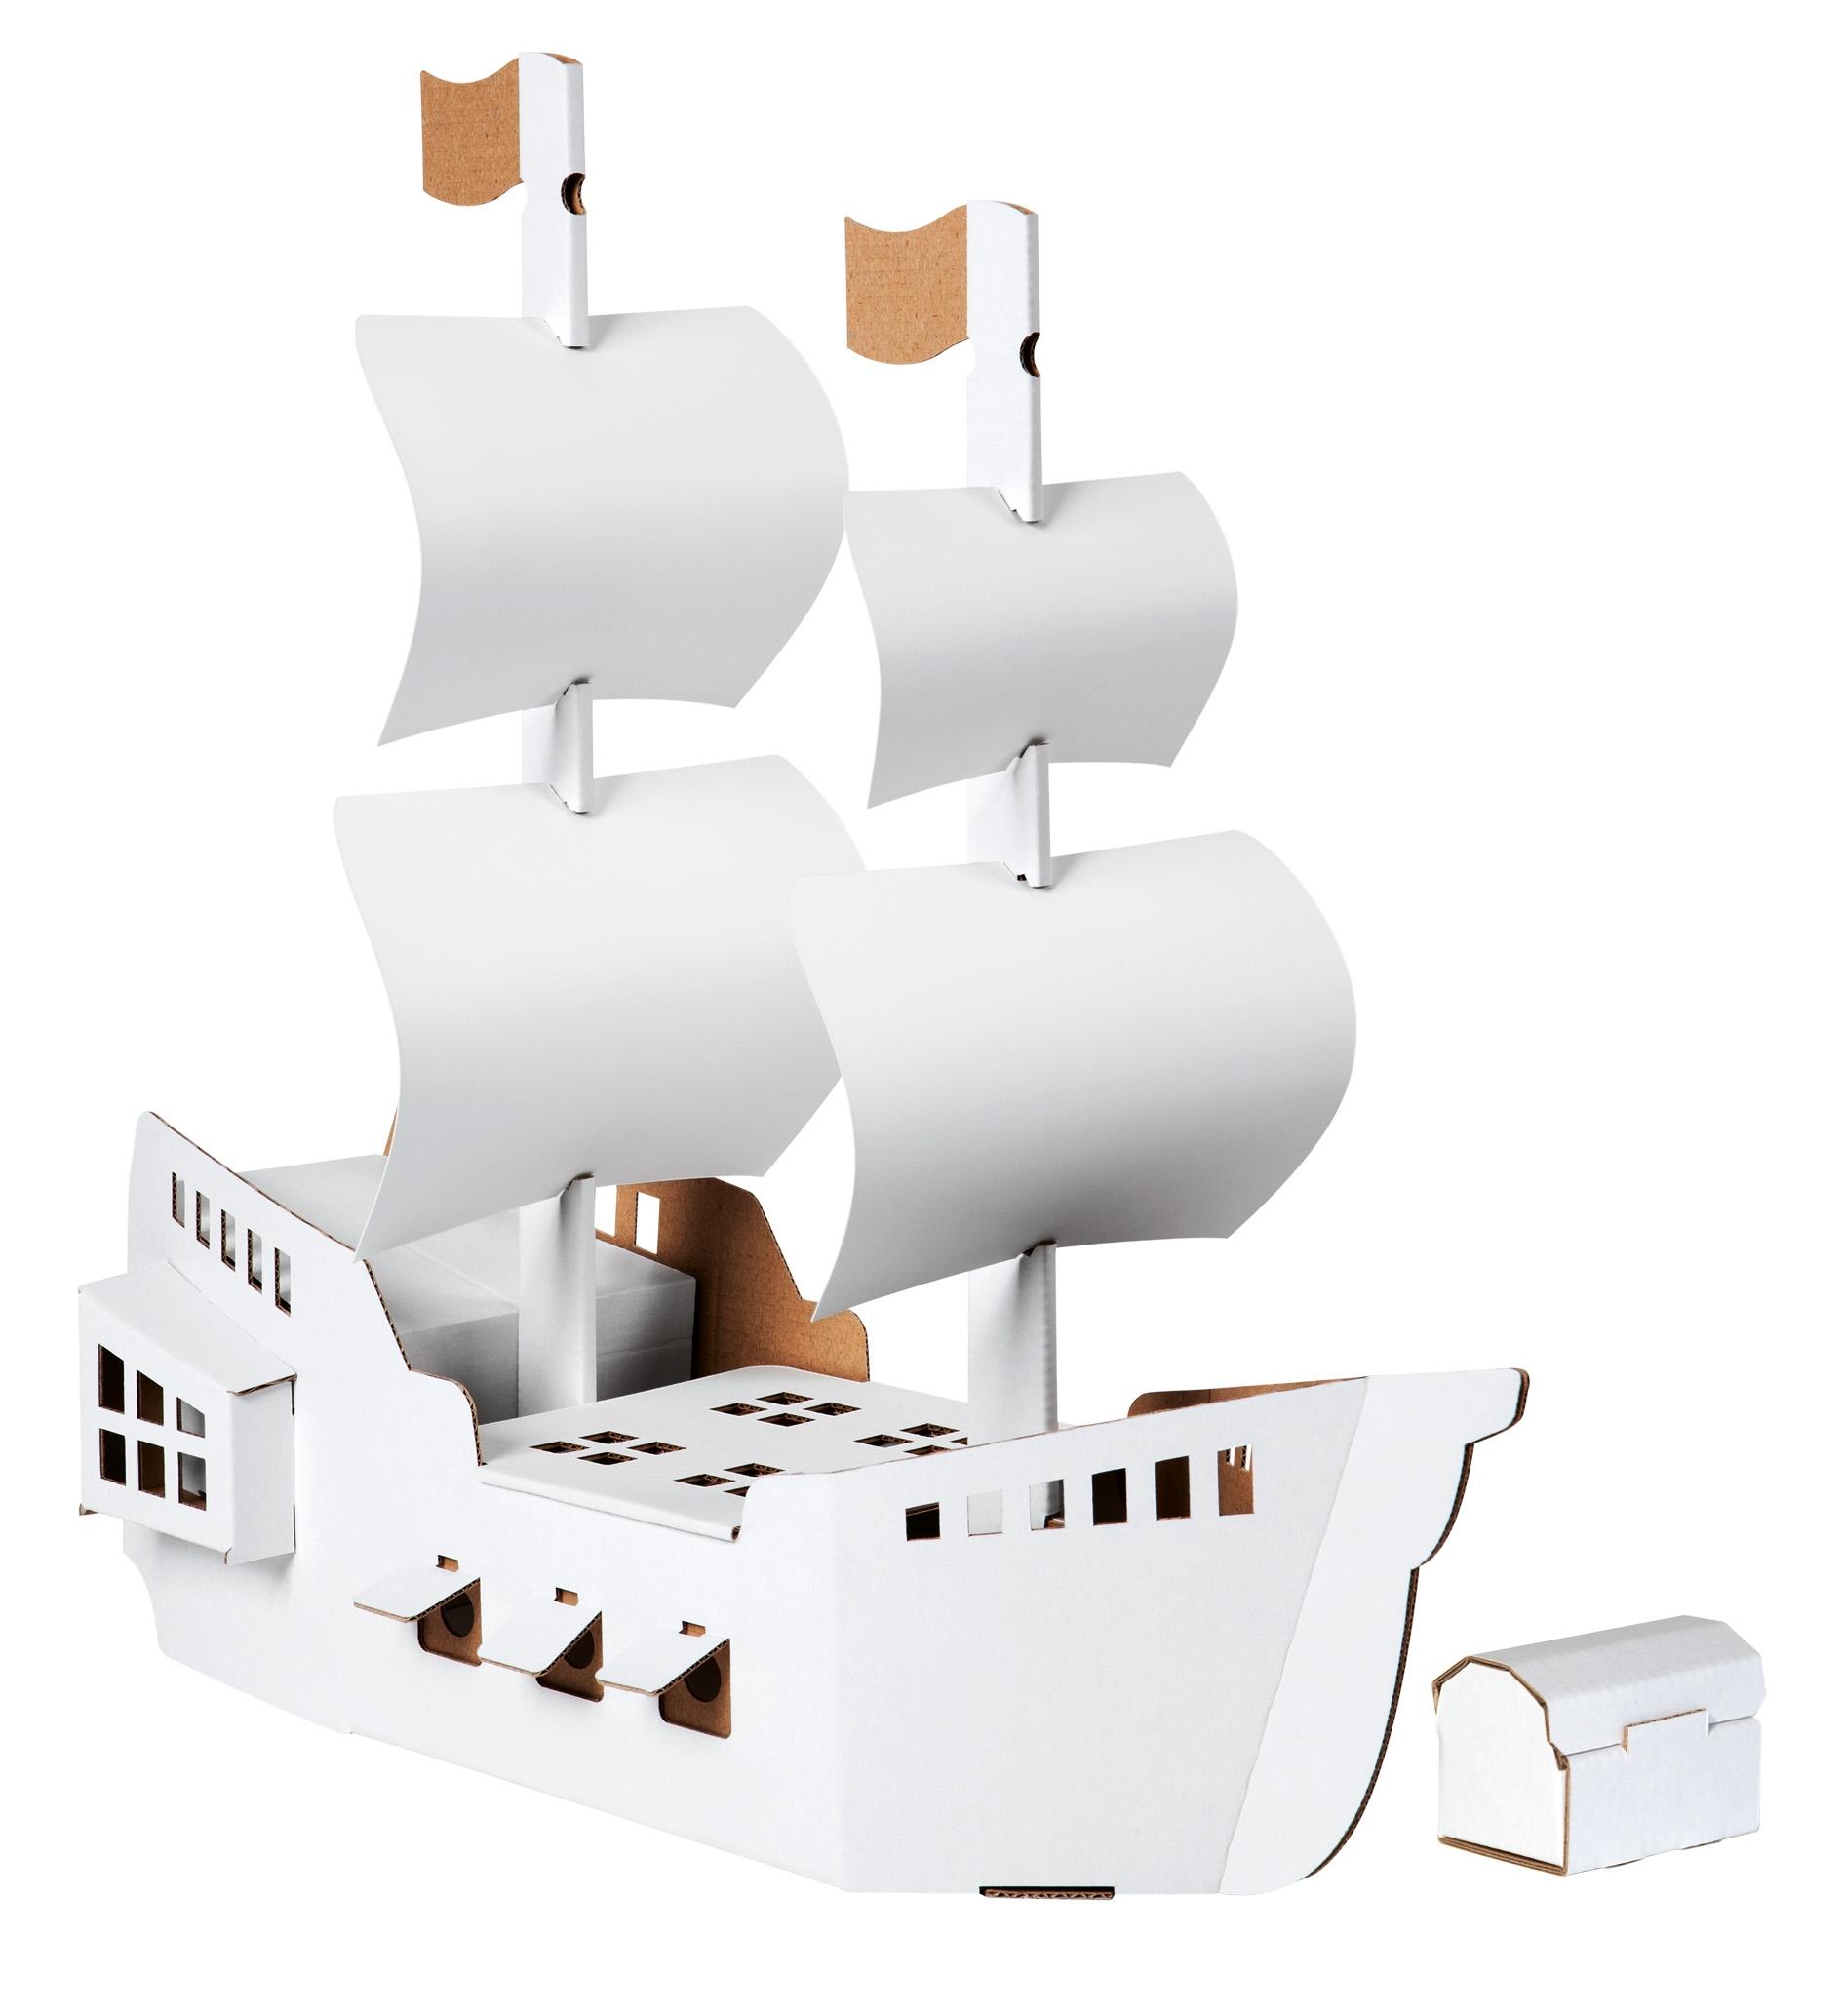 CALAFANT - pirate ship